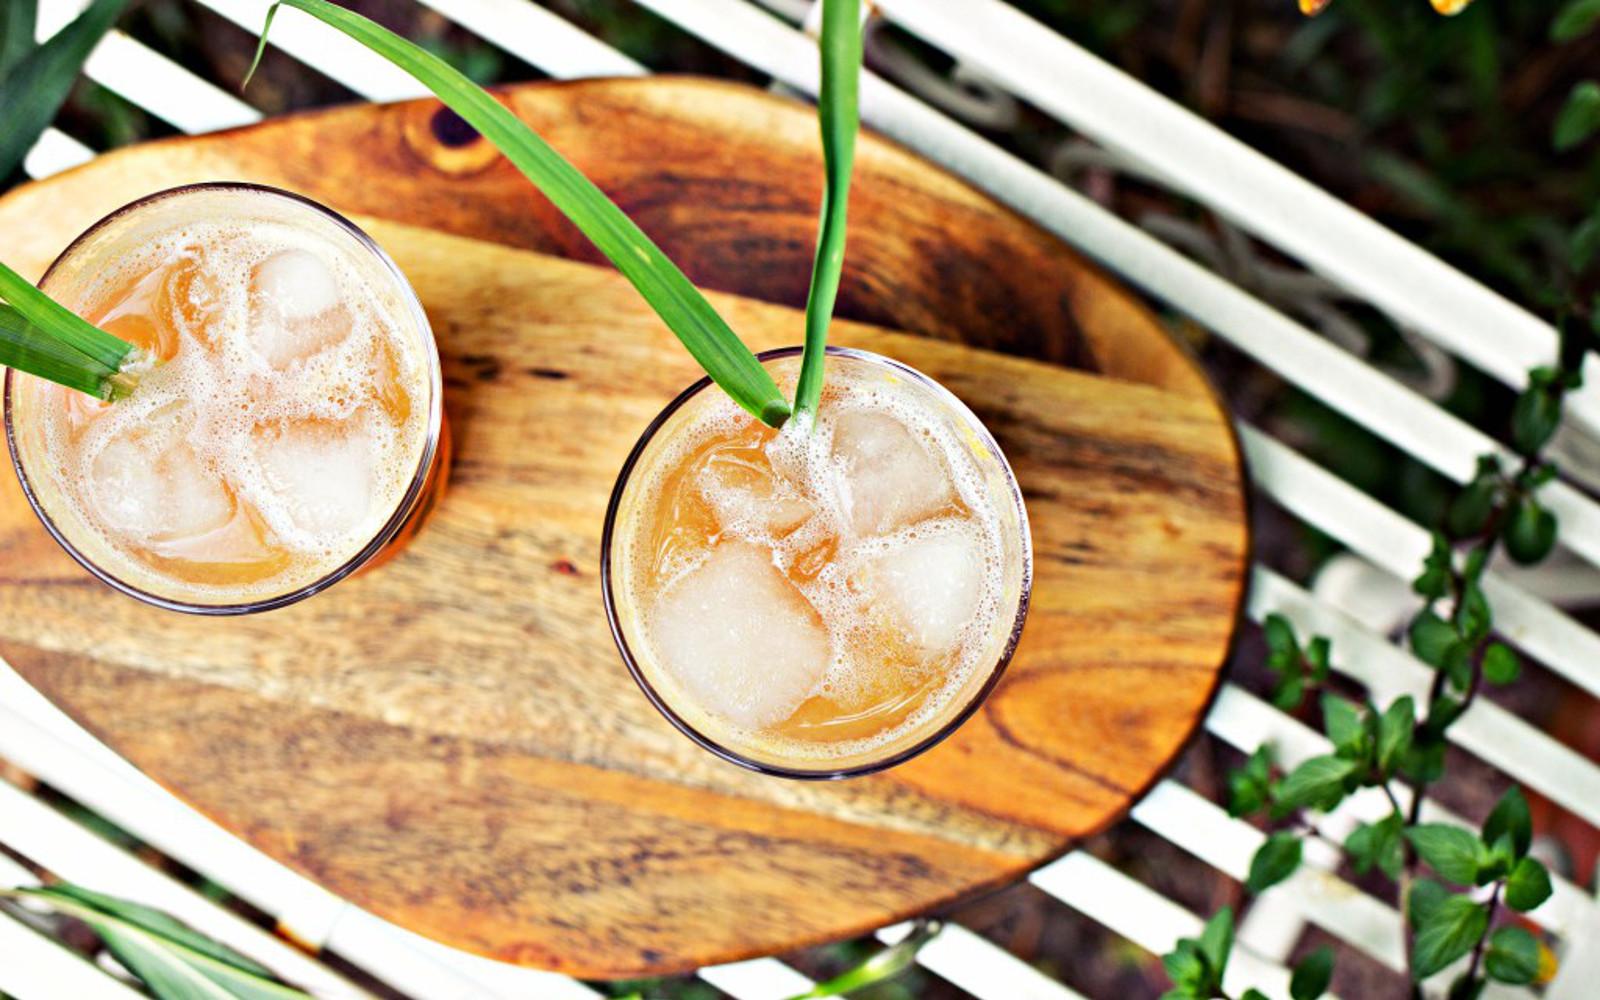 Peach and Lemongrass Shrub with apple cider vinegar